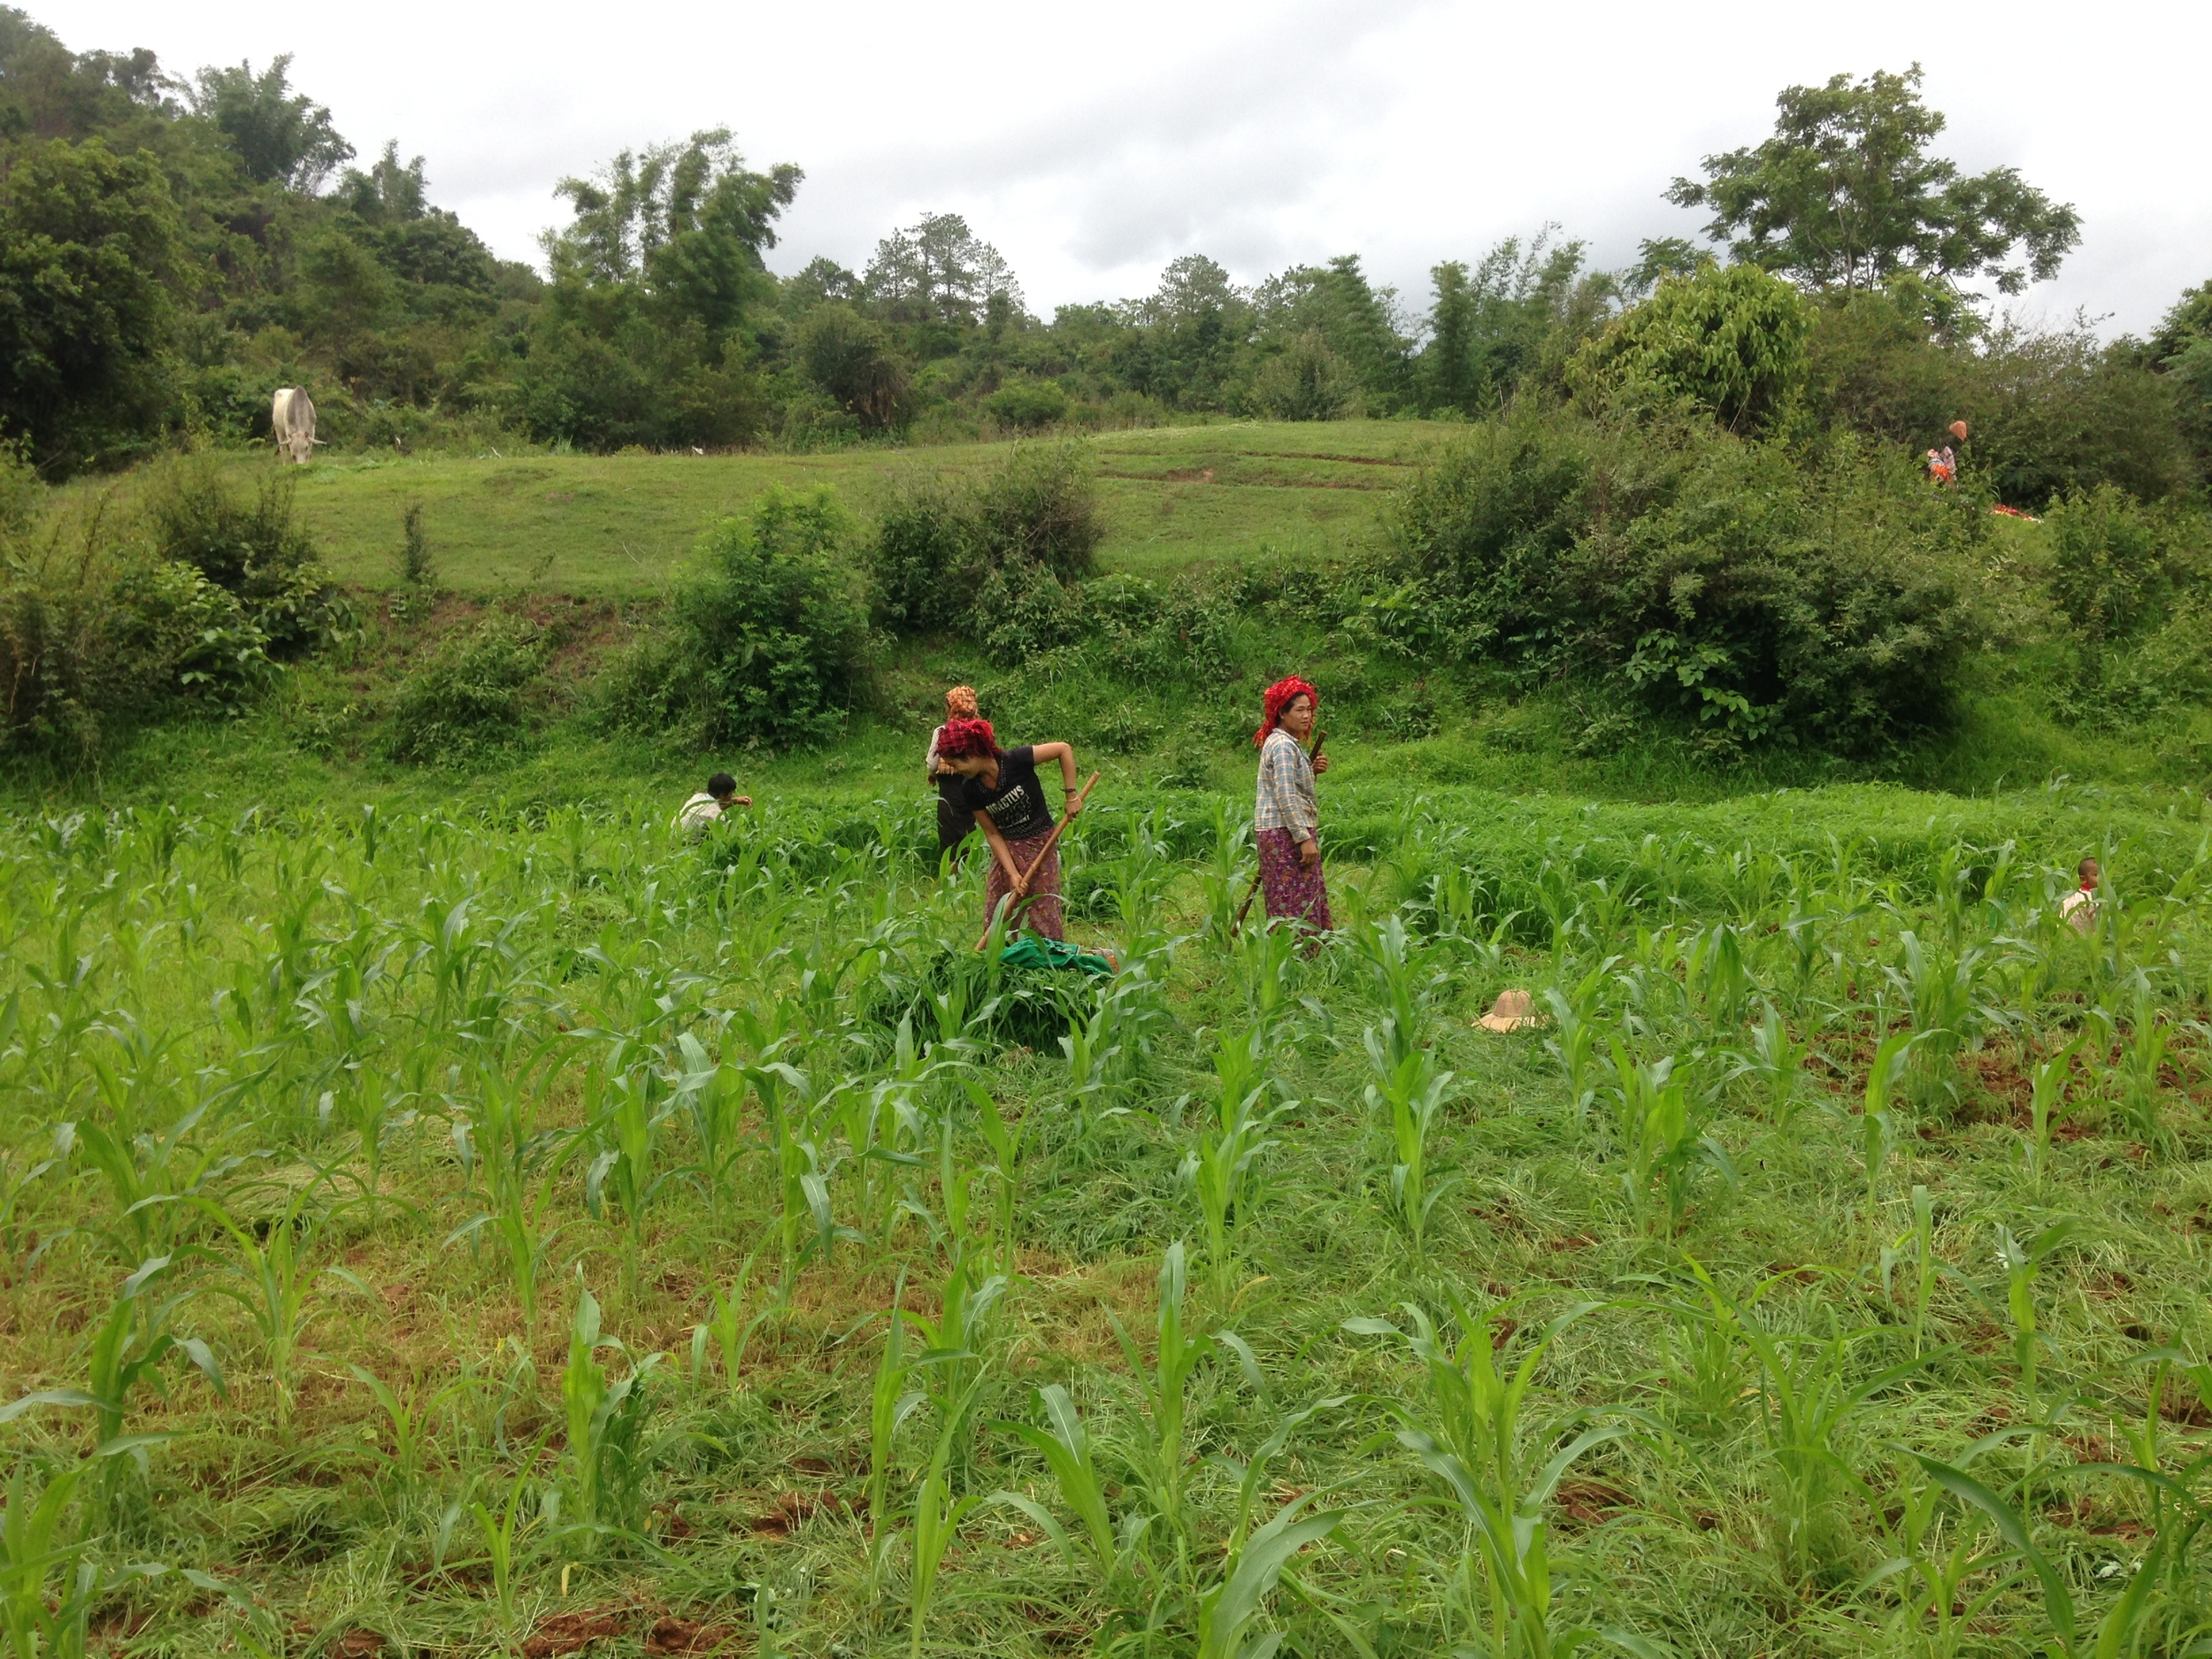 Local women working in the fields.